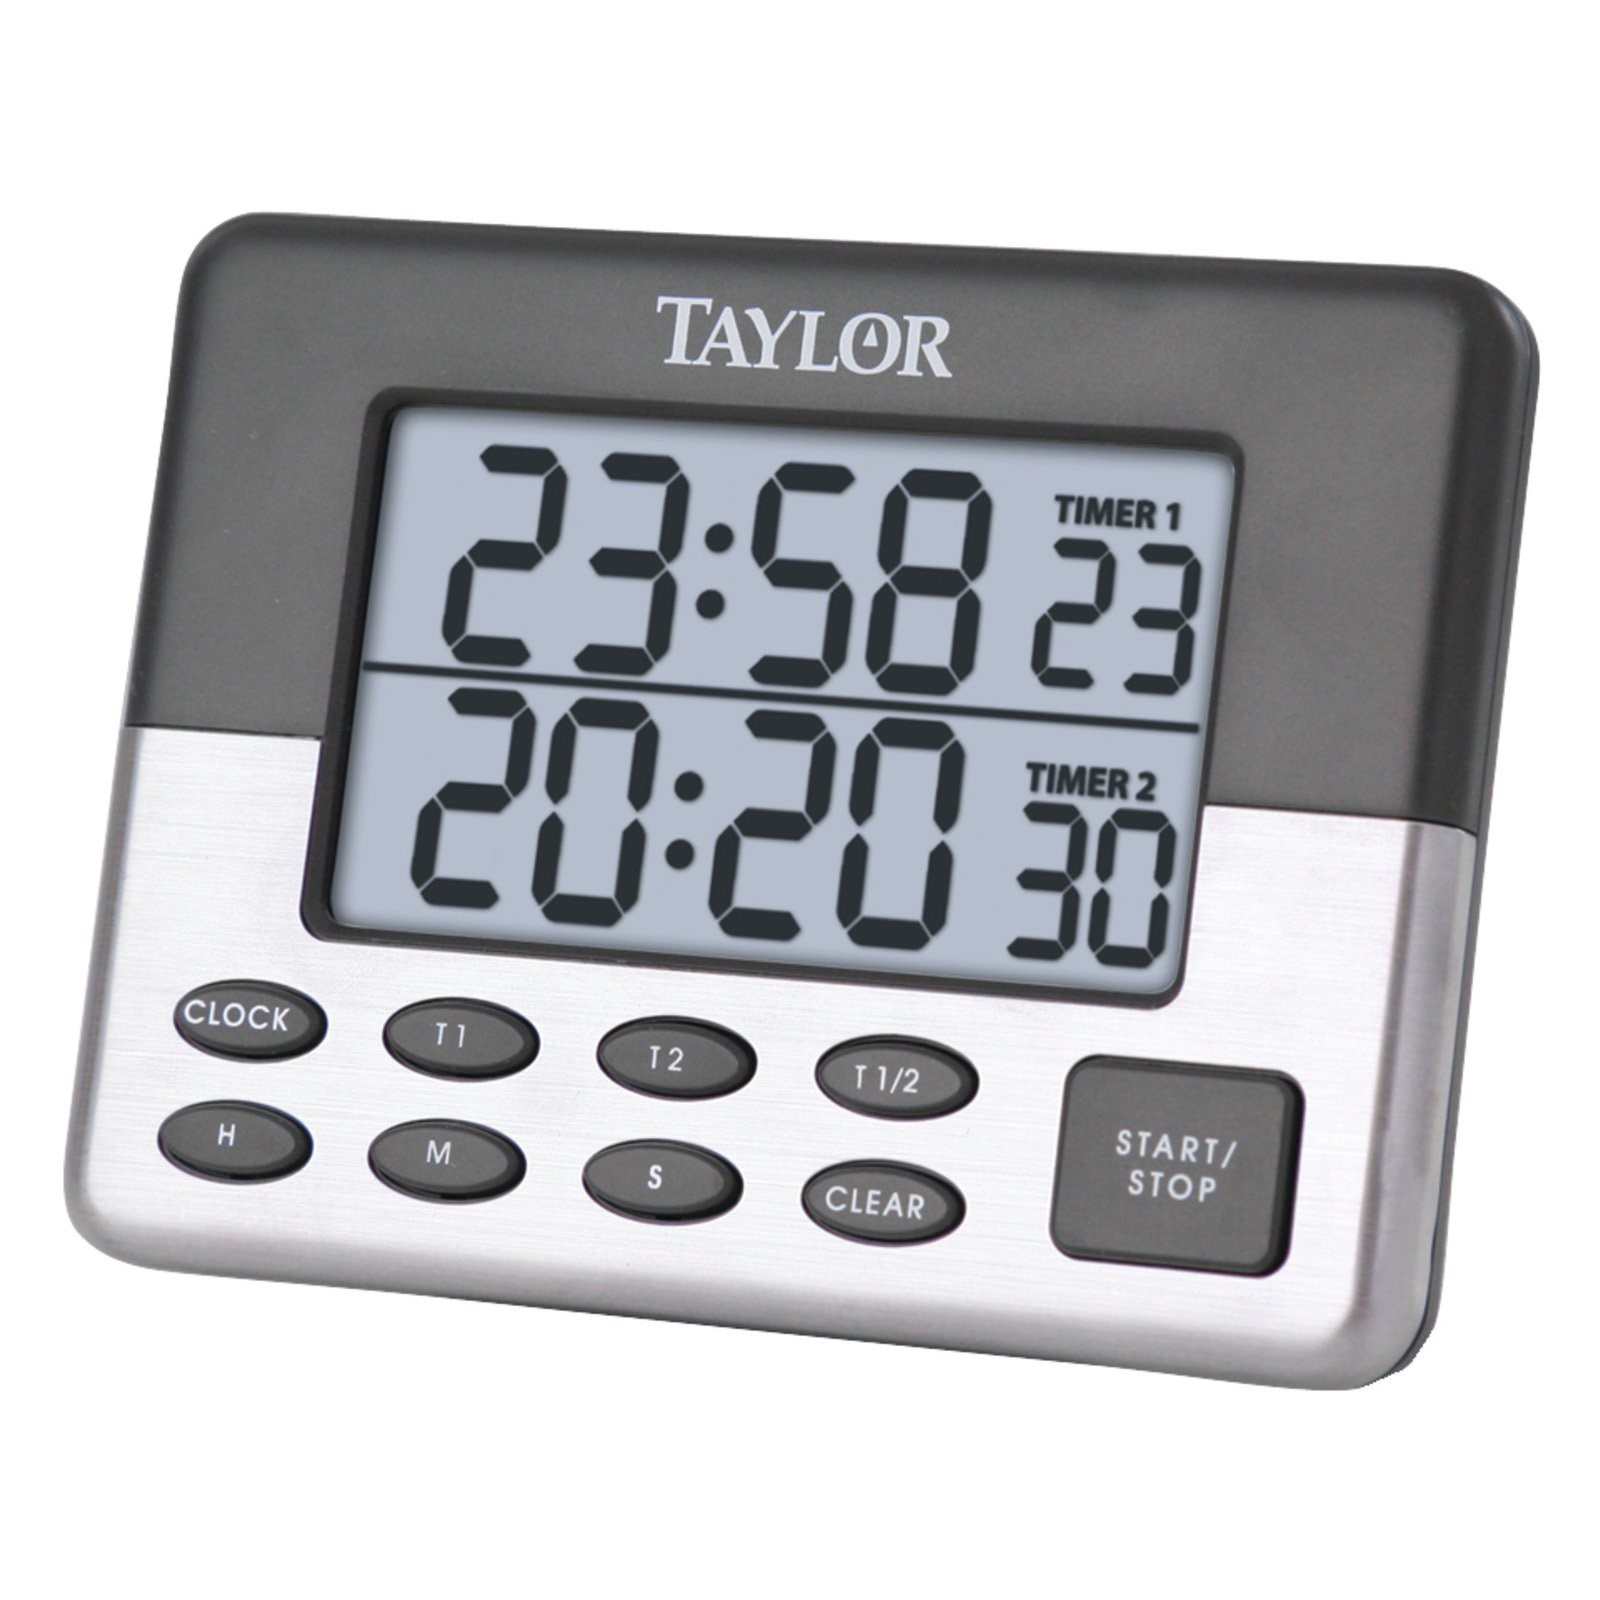 taylor kitchen timer lighting flush mount 5872 9 dual event digital walmart com